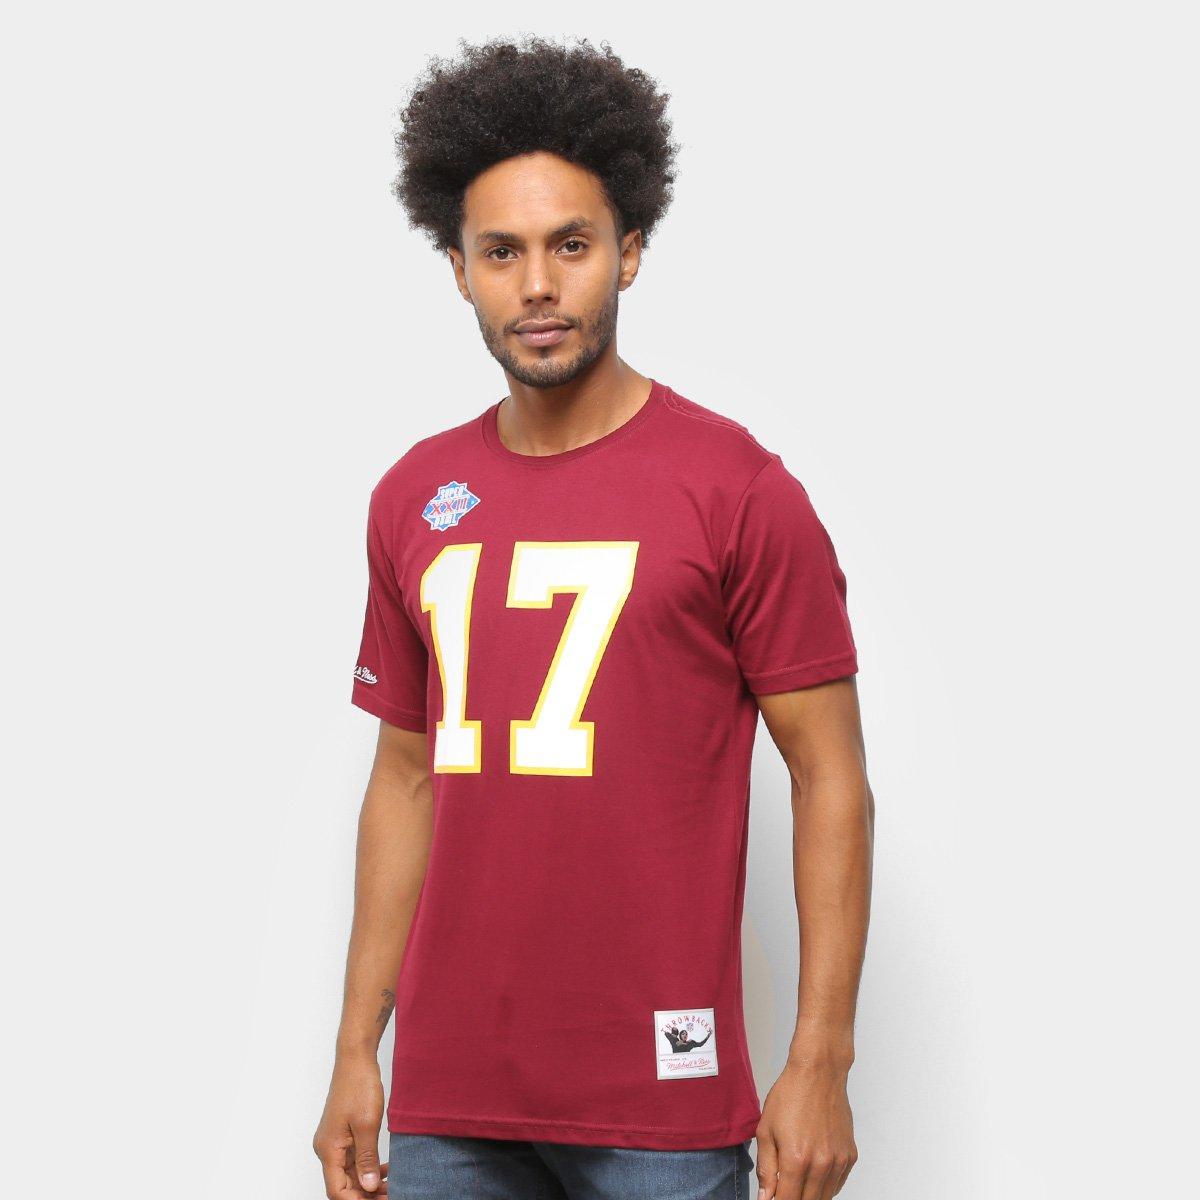 Camiseta NFL Washington Redskins nº 17 Doug Williams Mitchell & Ness Masculina